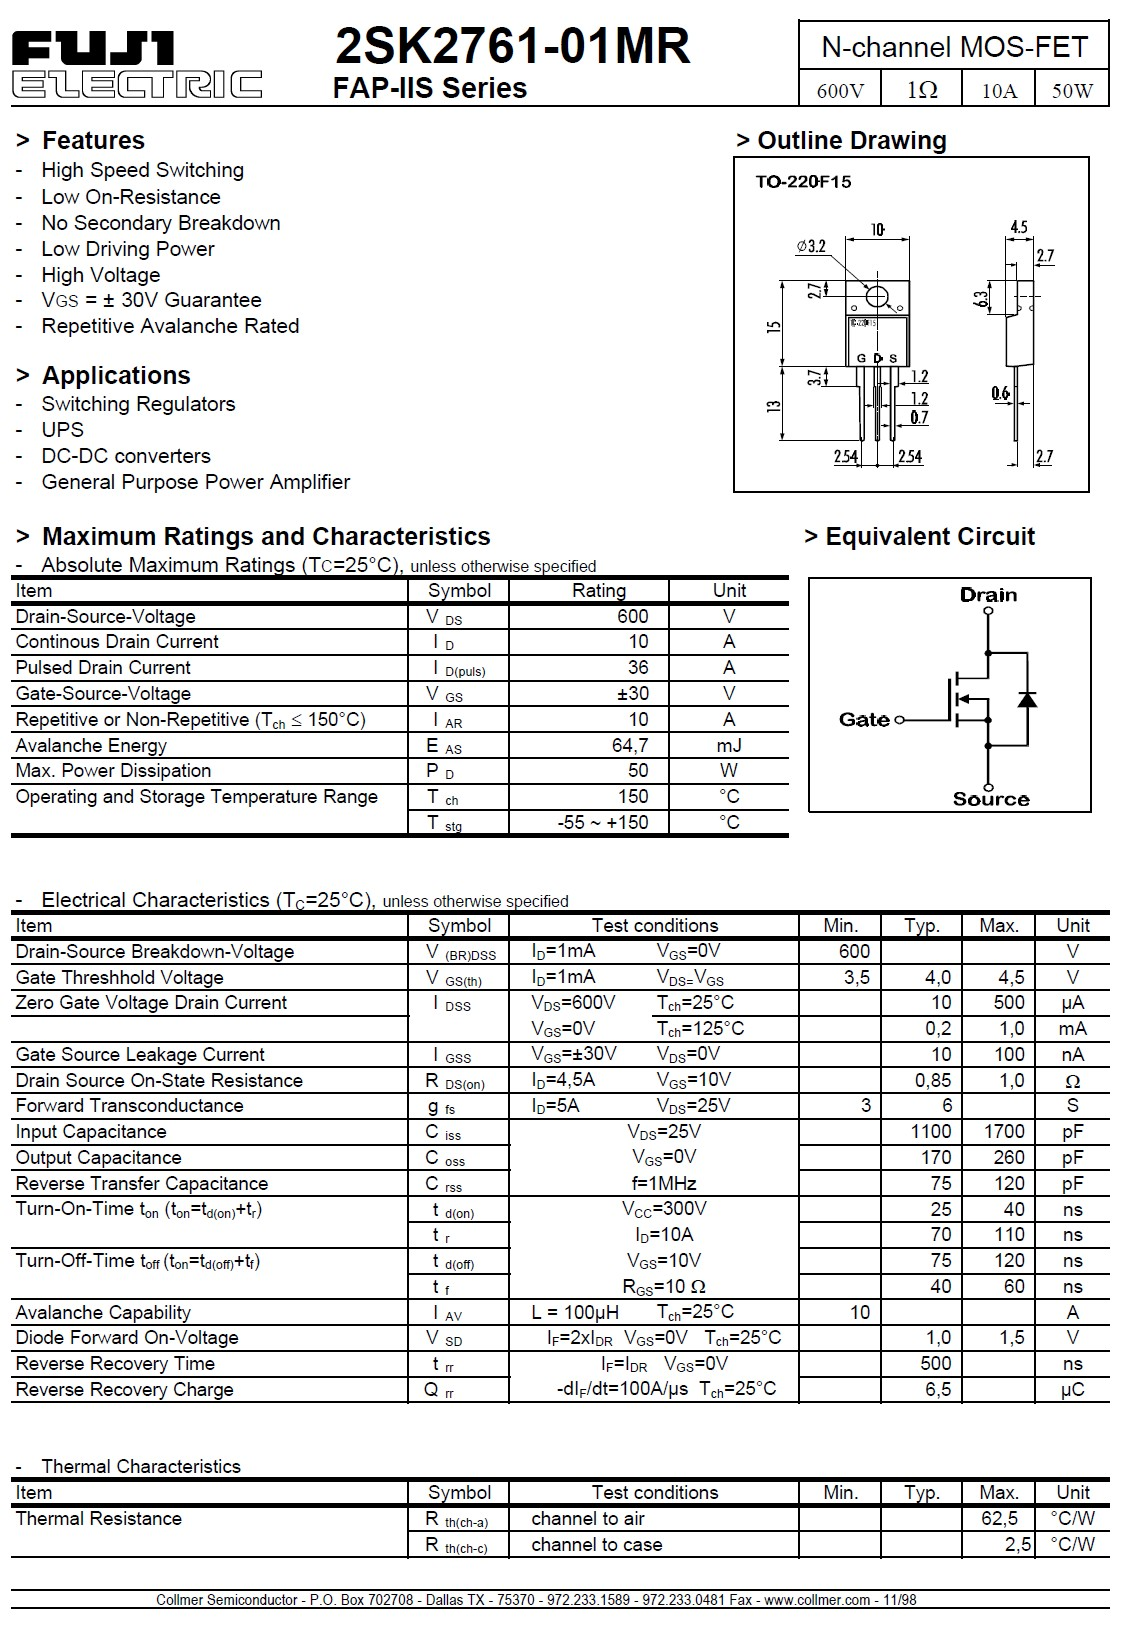 Tranzisztor N-MOSFET 600V 10A/36Ap 50W 1R (5.5A) 2SK2761 2SK2761 -